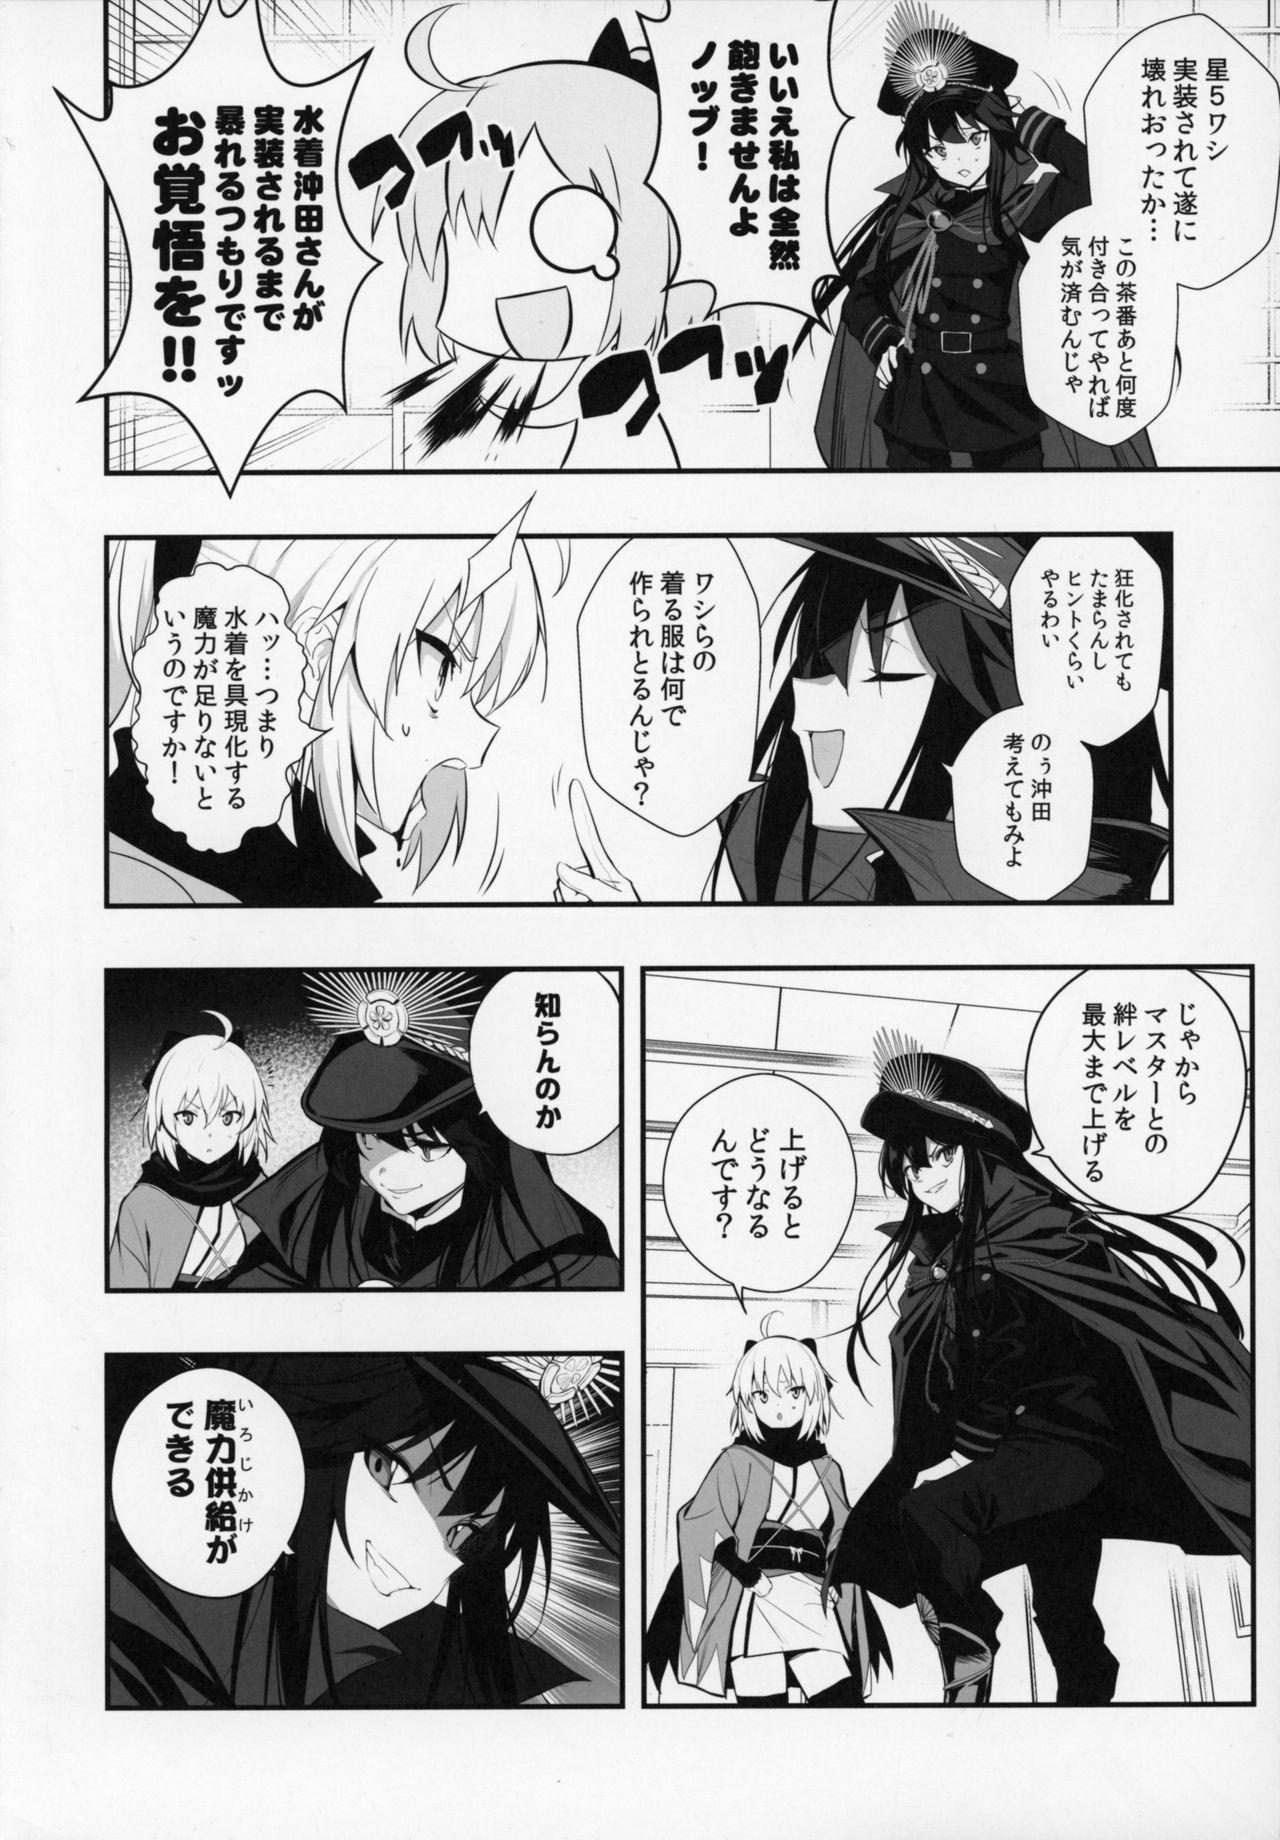 Okita-san wa Mizugi ga Kitai 2